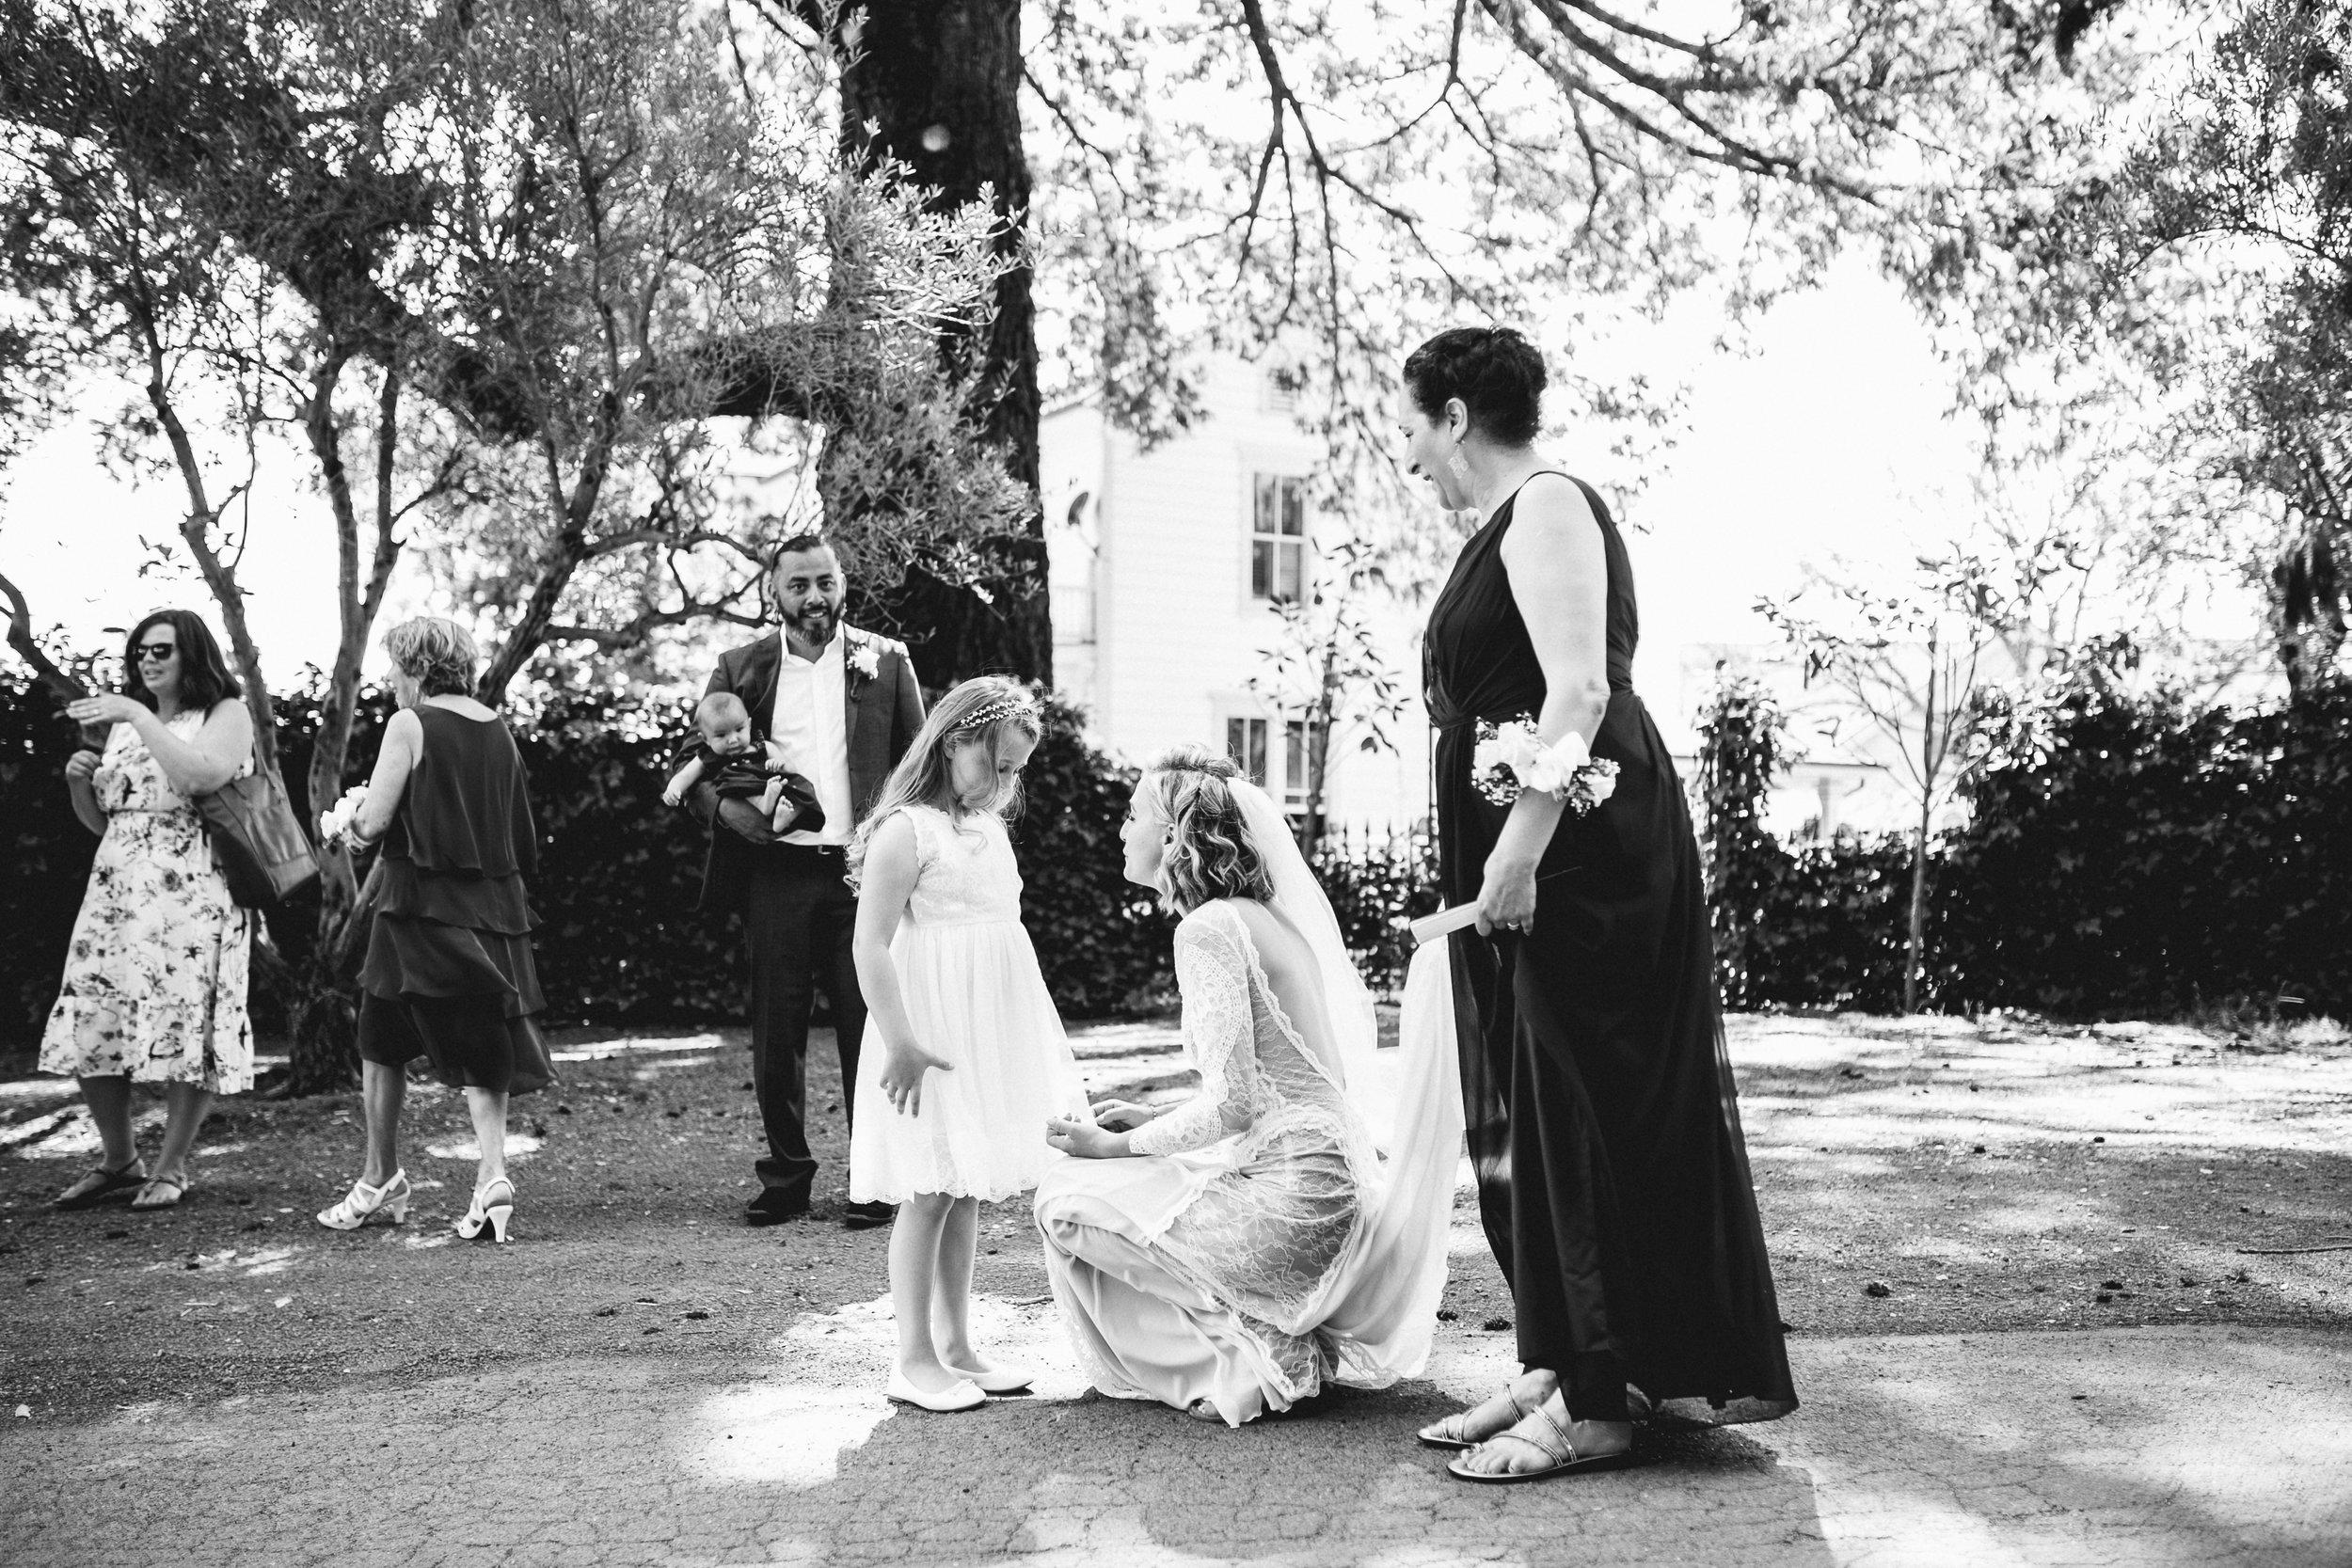 180527_JKM_Paula_Brian_Wedding_Final-19899.jpg